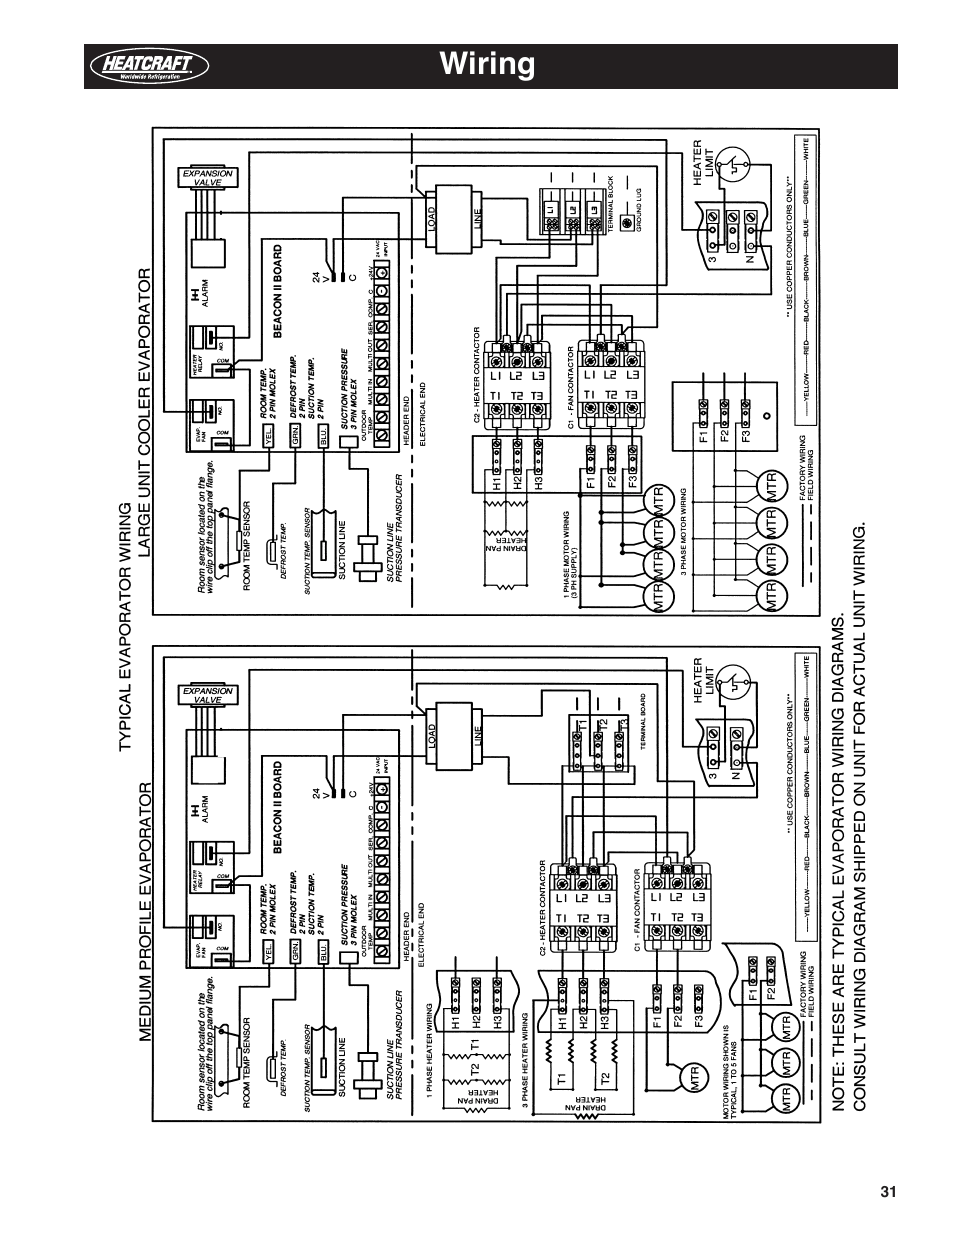 hight resolution of heatcraft refrigeration wiring diagrams